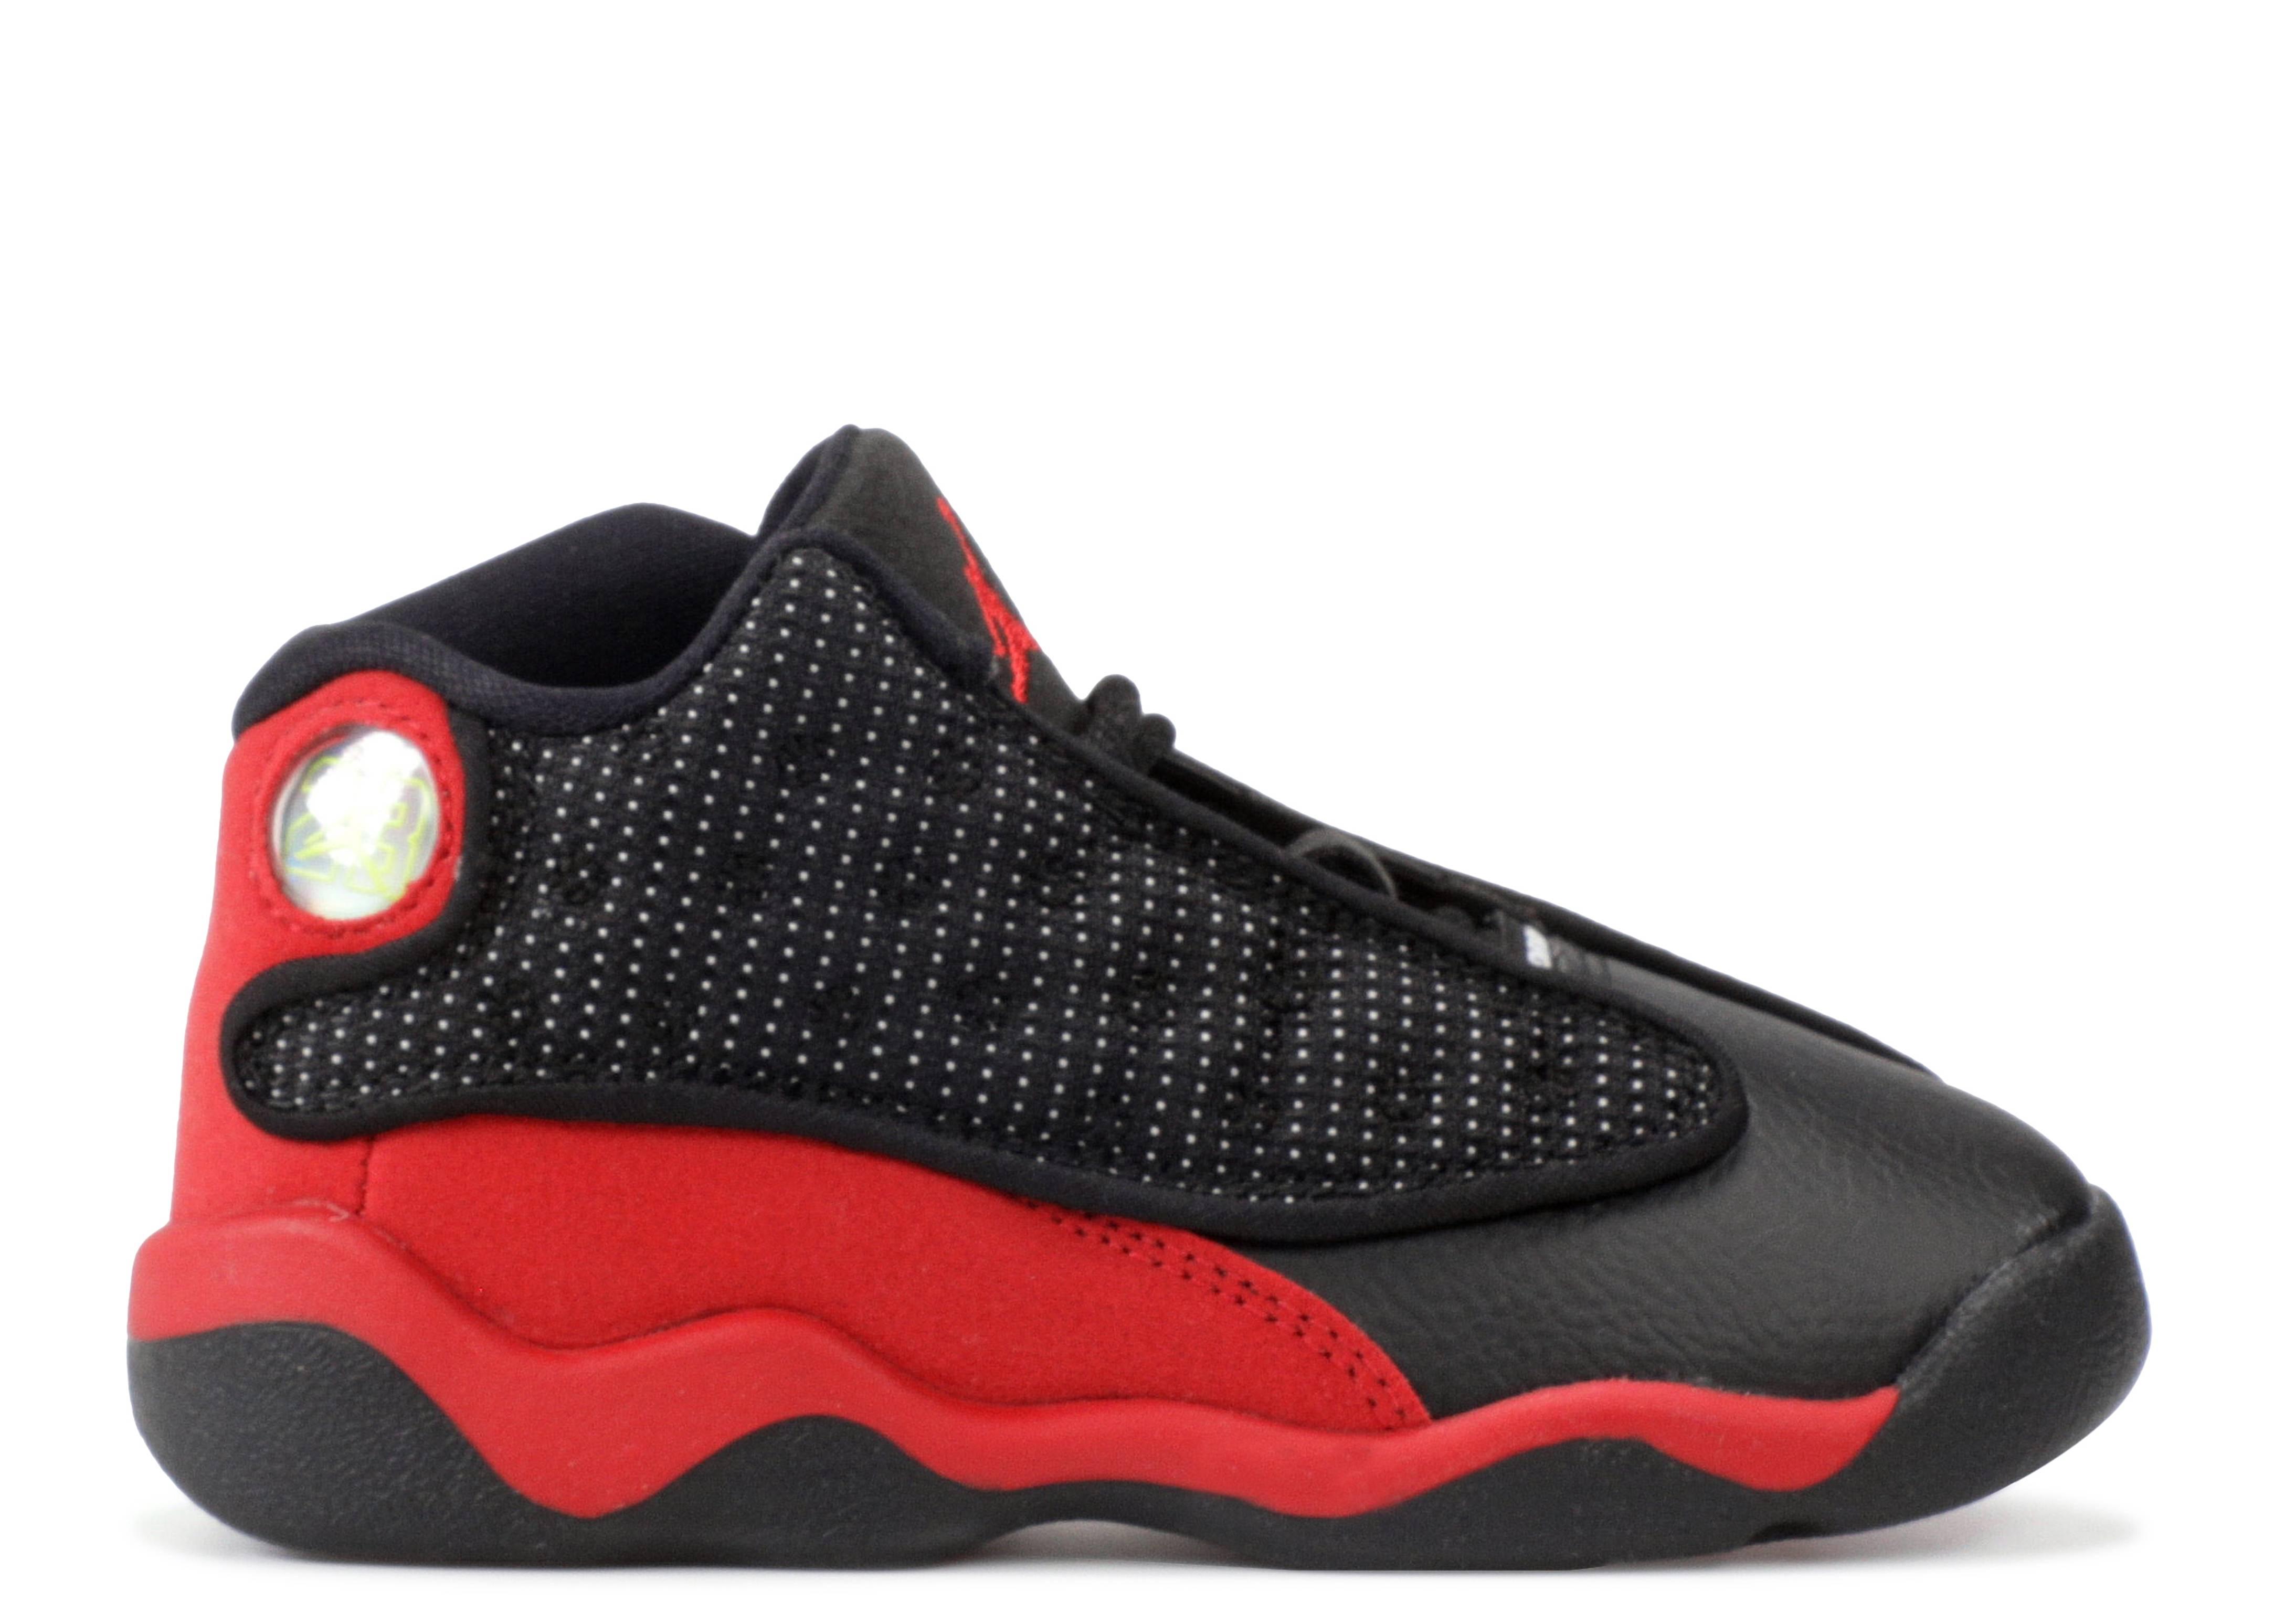 be685e6a34b38b Jordan 13 Retro Bt - Air Jordan - 414581 004 - black true red-white ...